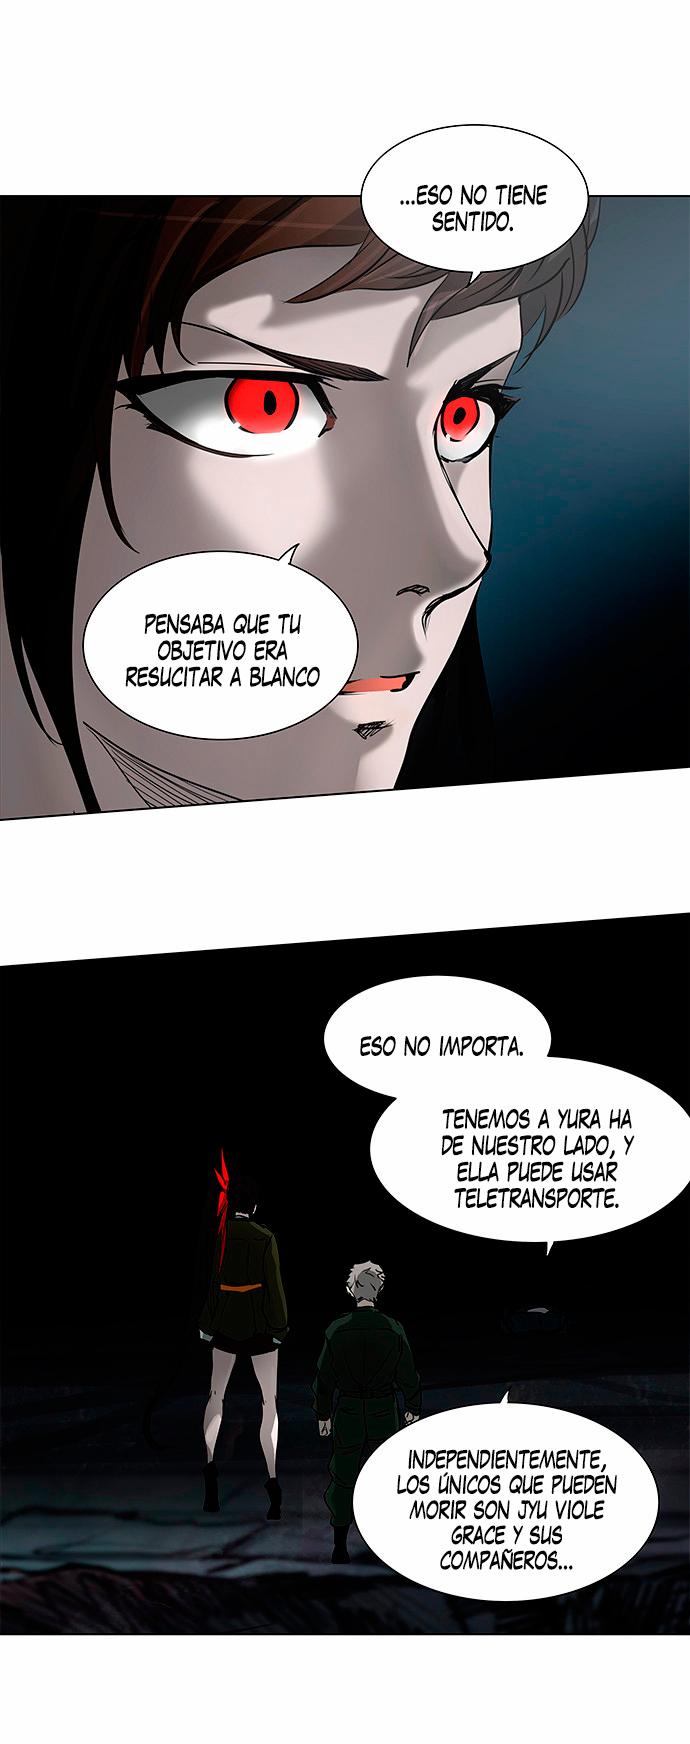 http://c5.ninemanga.com/es_manga/21/149/450449/32904dc1f0b2421cf3a47ba92d440b17.jpg Page 4